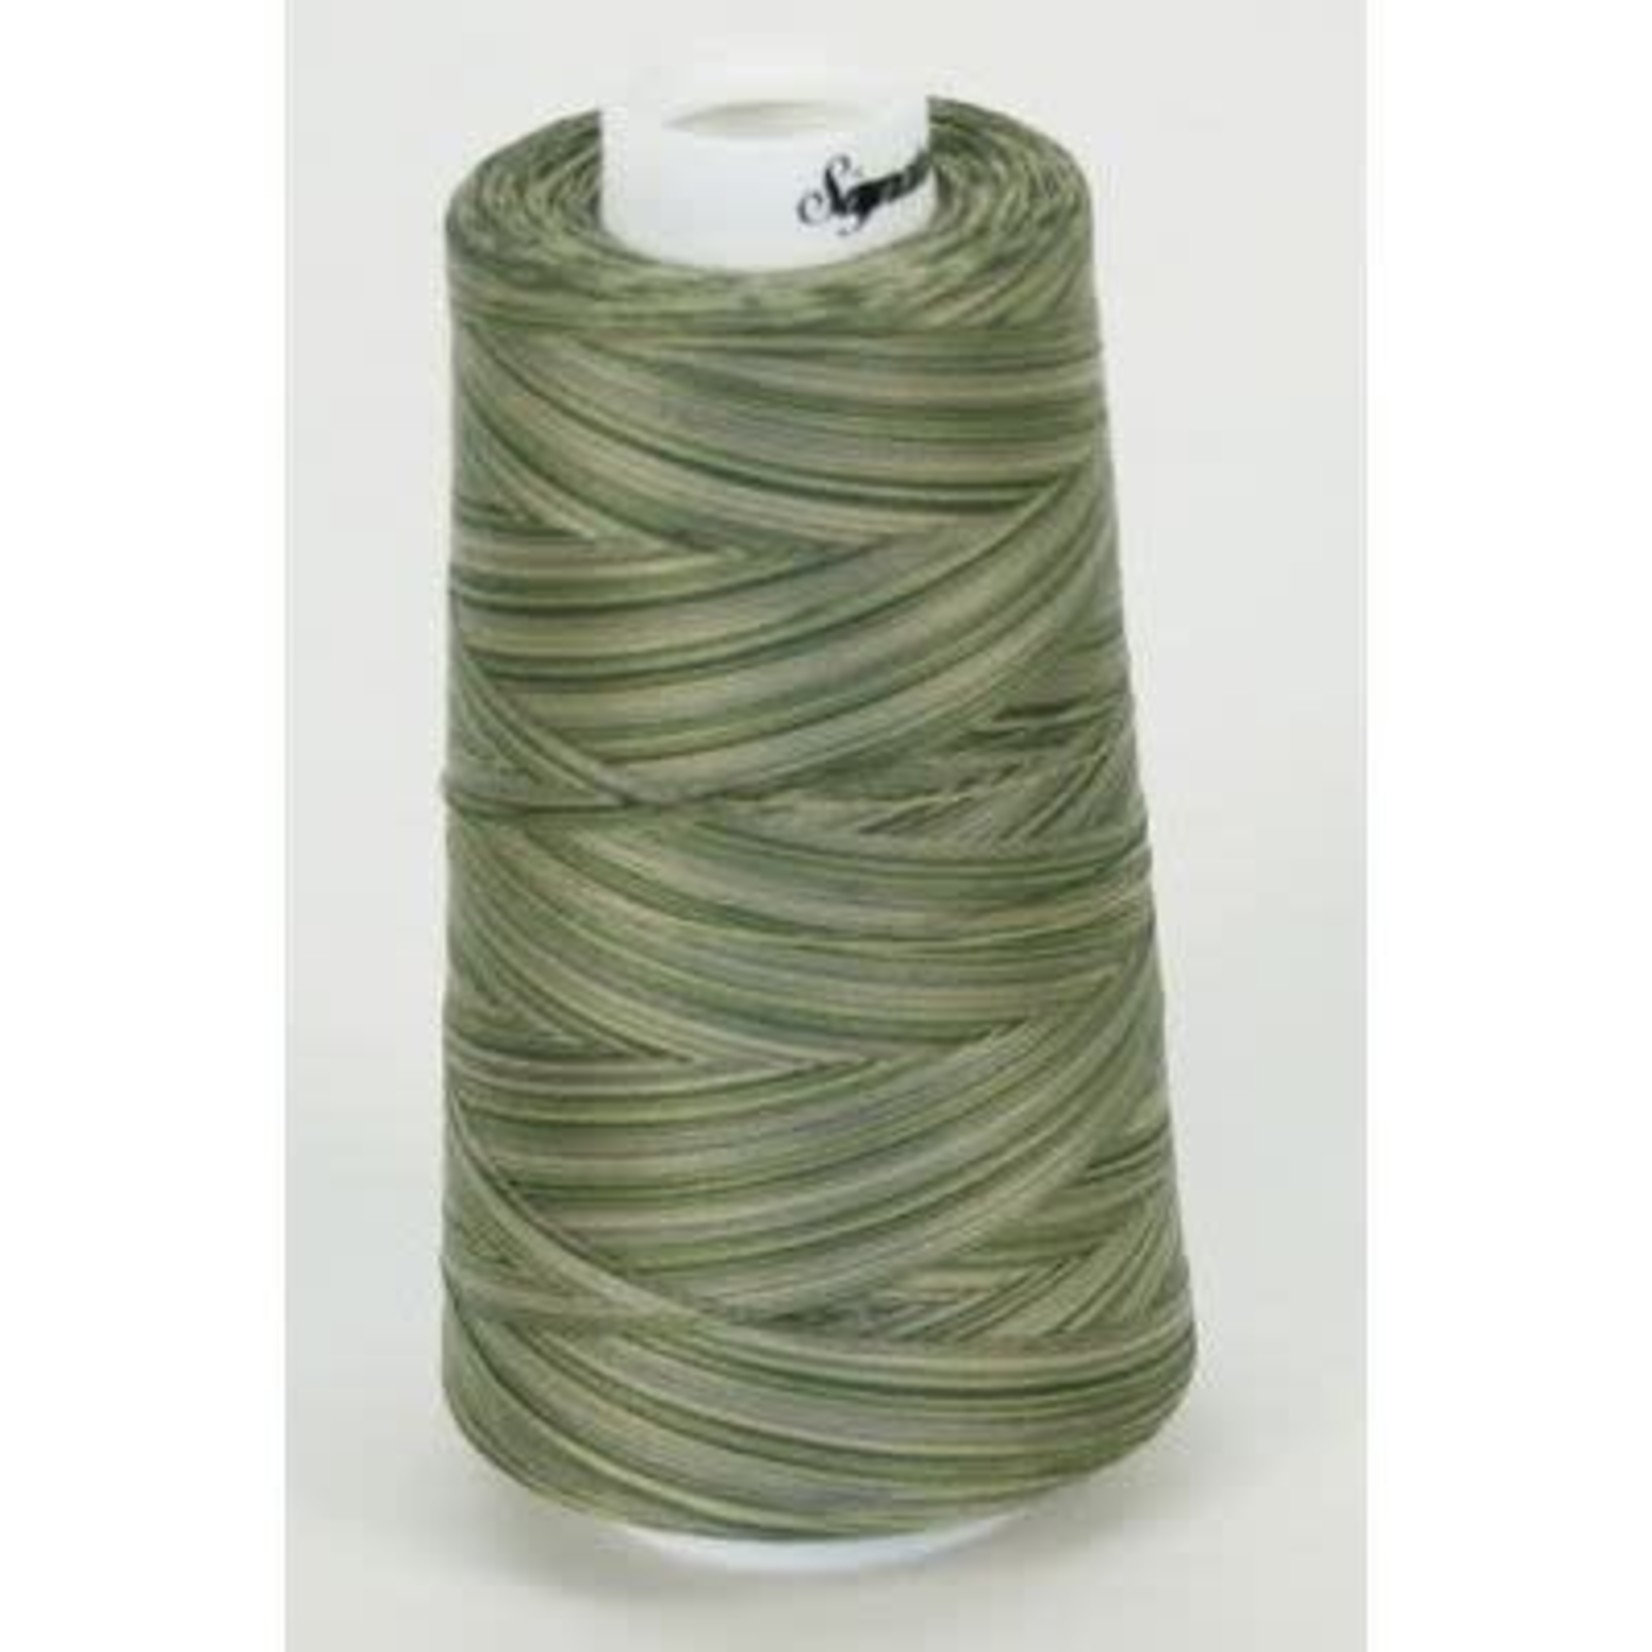 A & E Greyish Greens, Signature Cotton